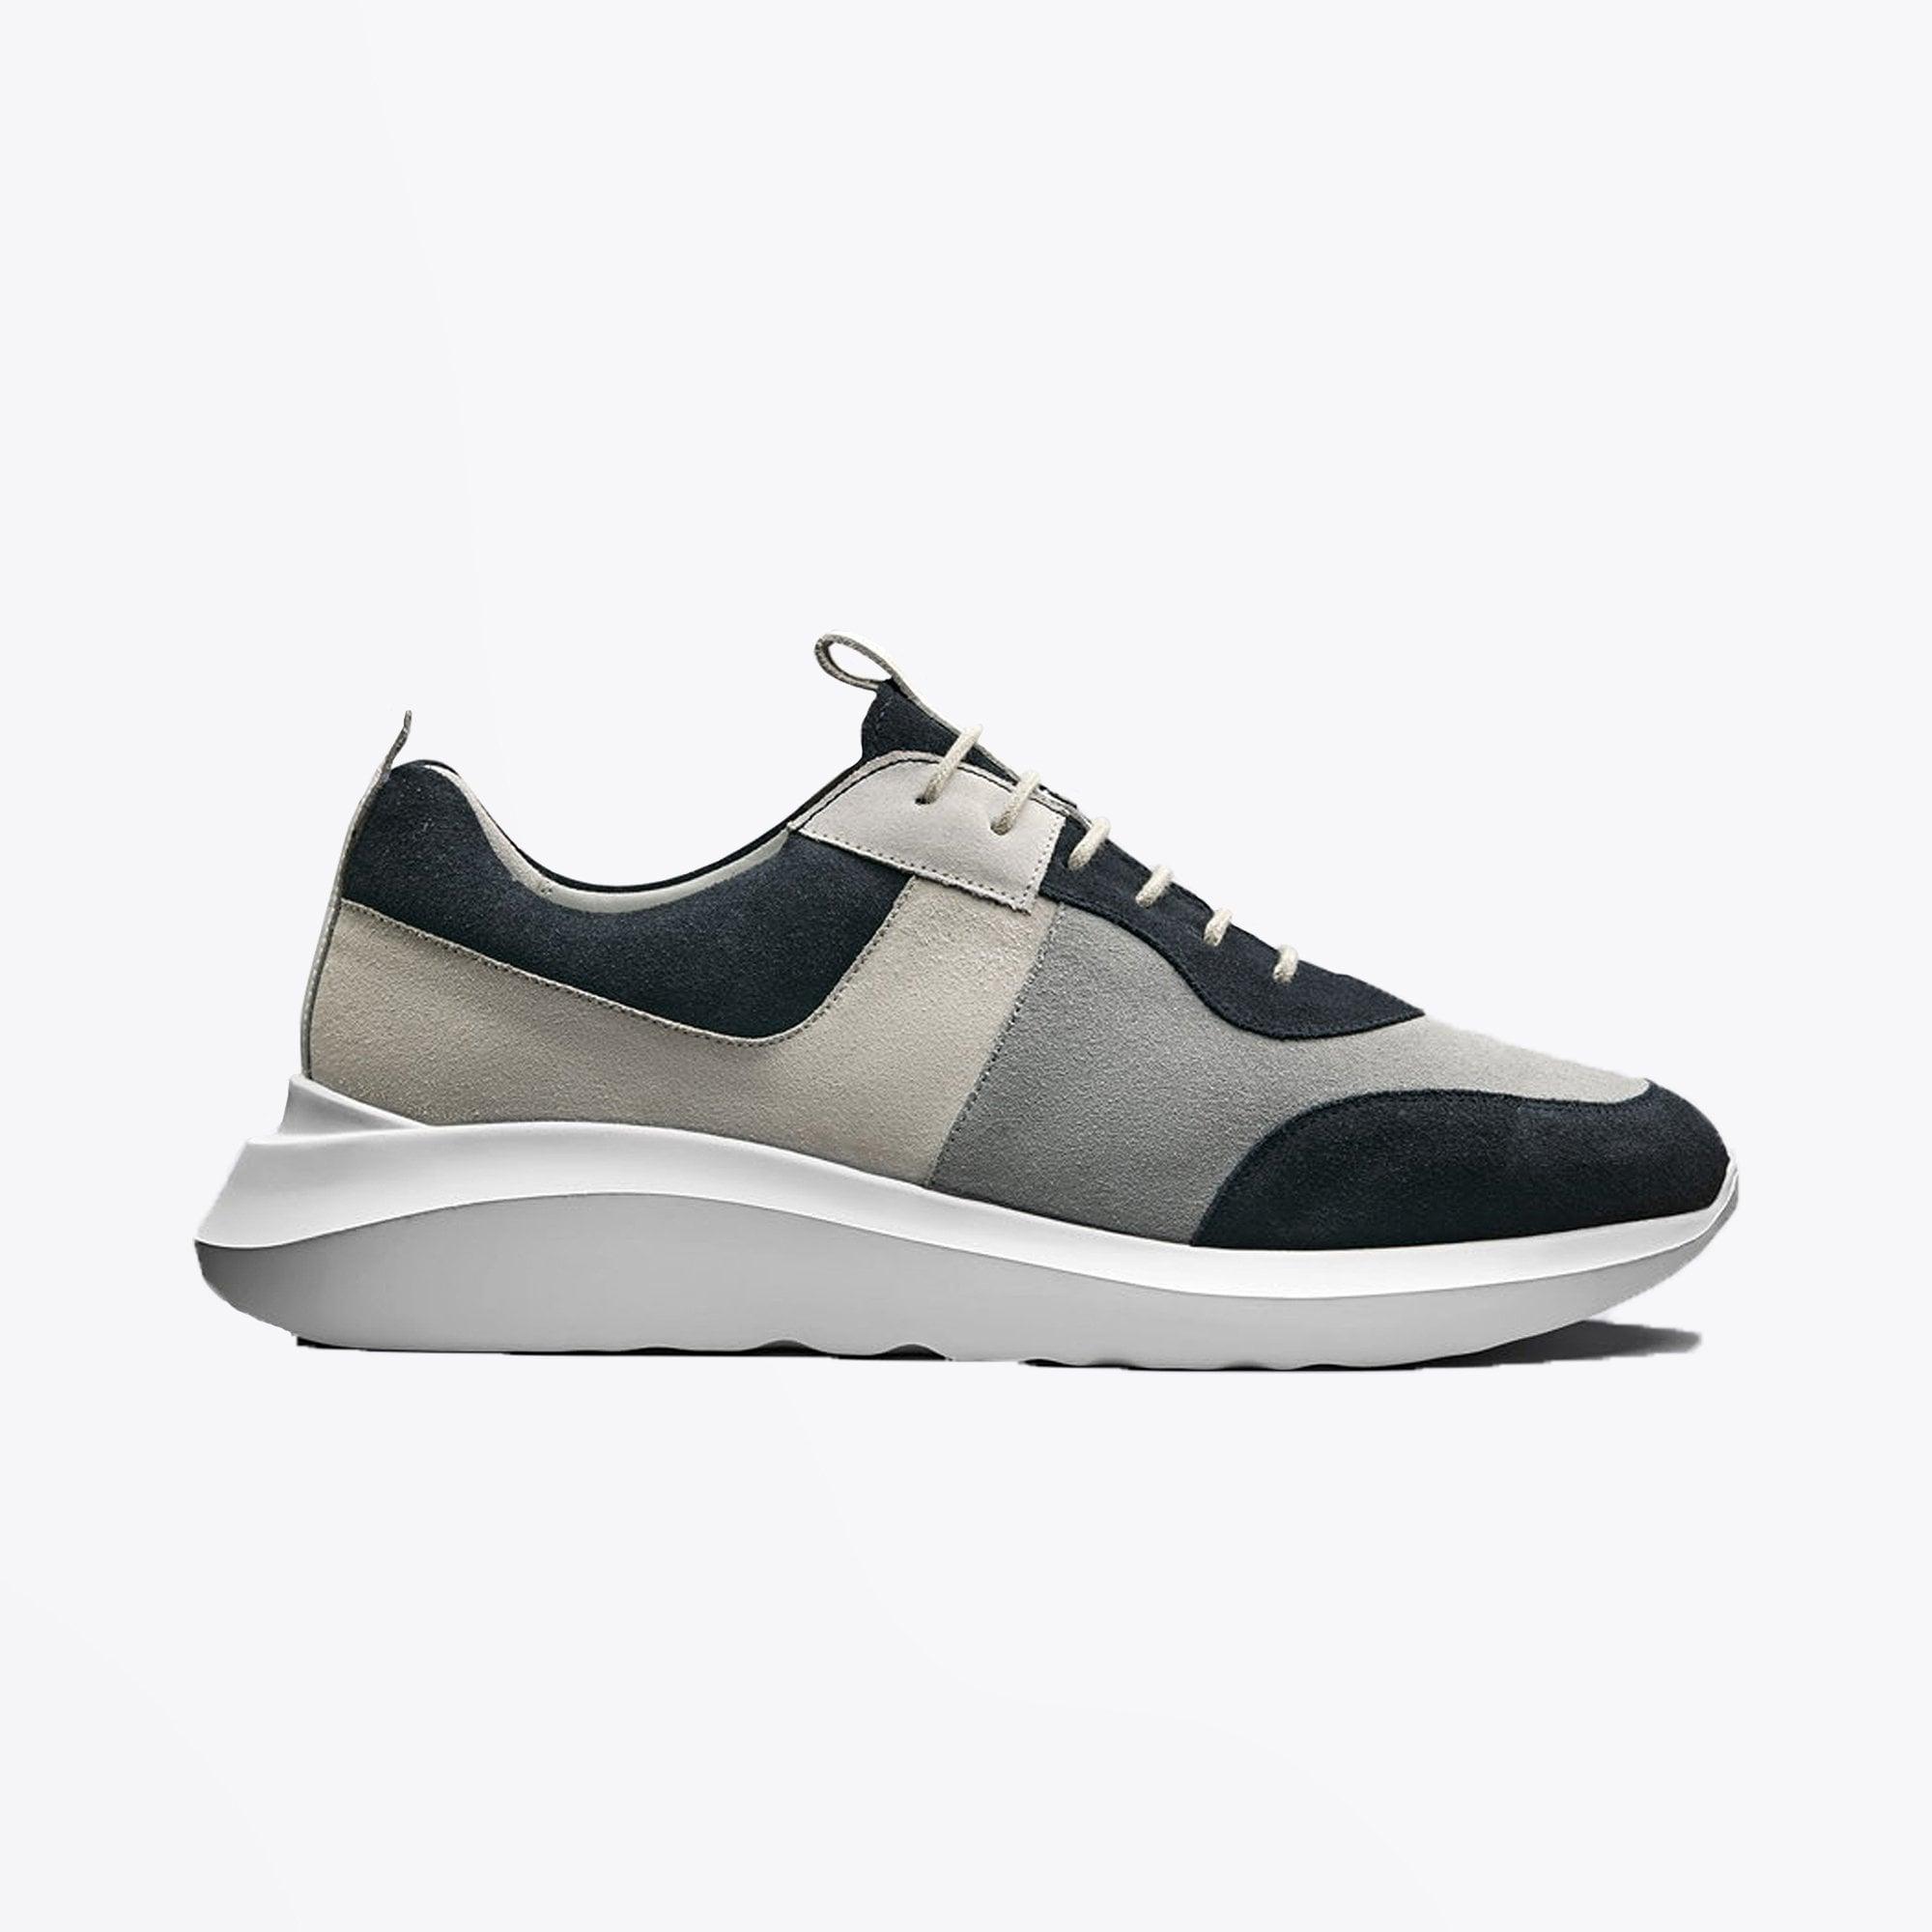 Grenson - Sneaker 20 - Suede Sneakers